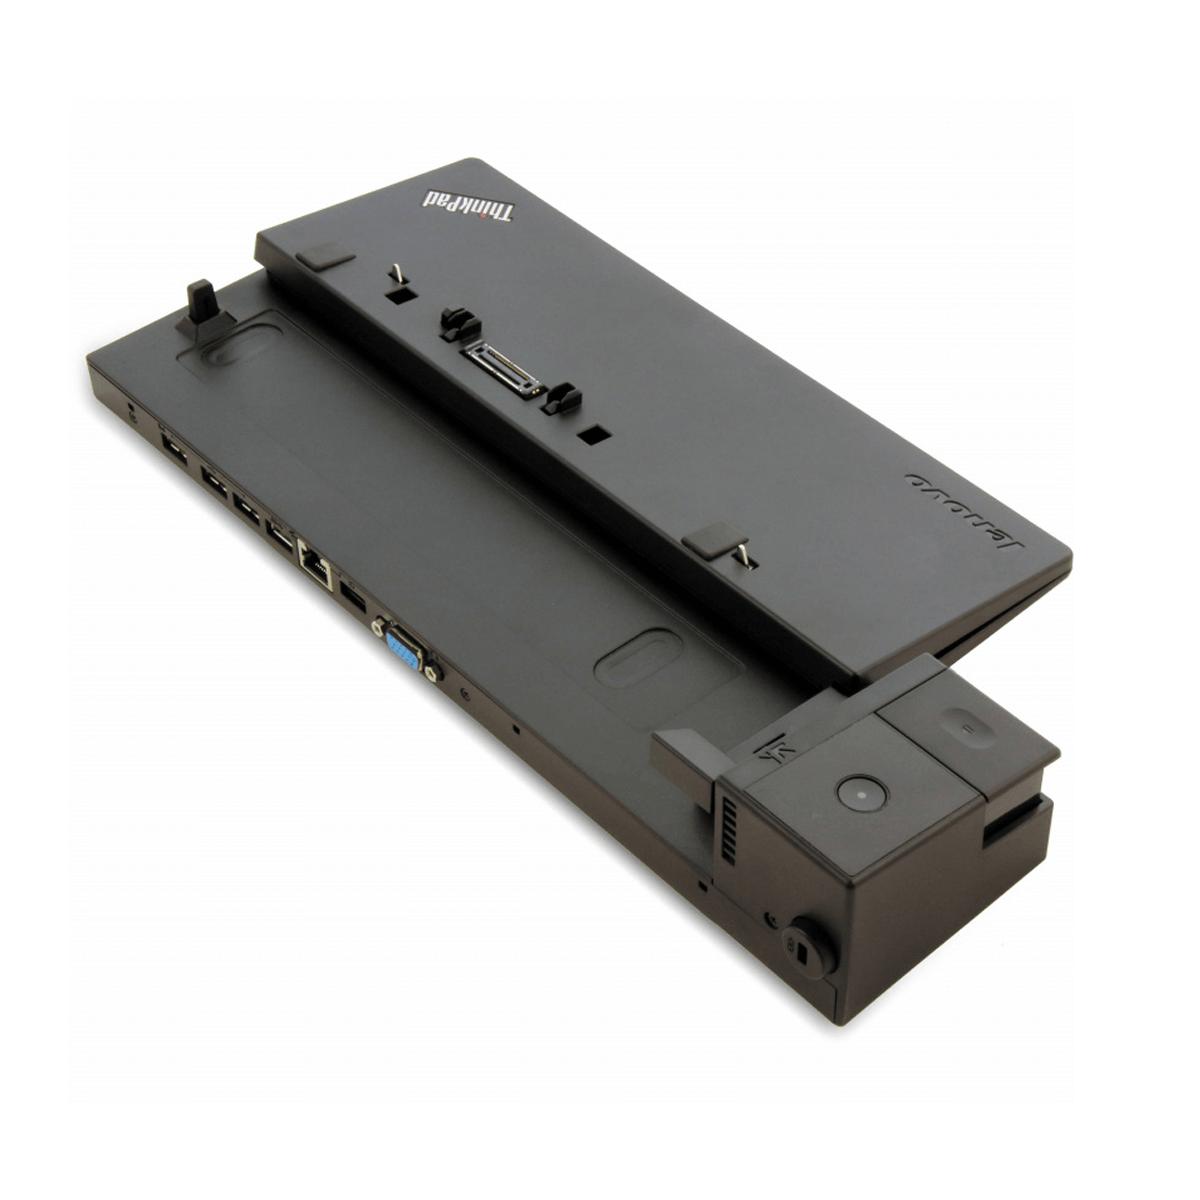 ThinkPad Basic Dock - 65W (MY/SG/HK) for X260, T460s